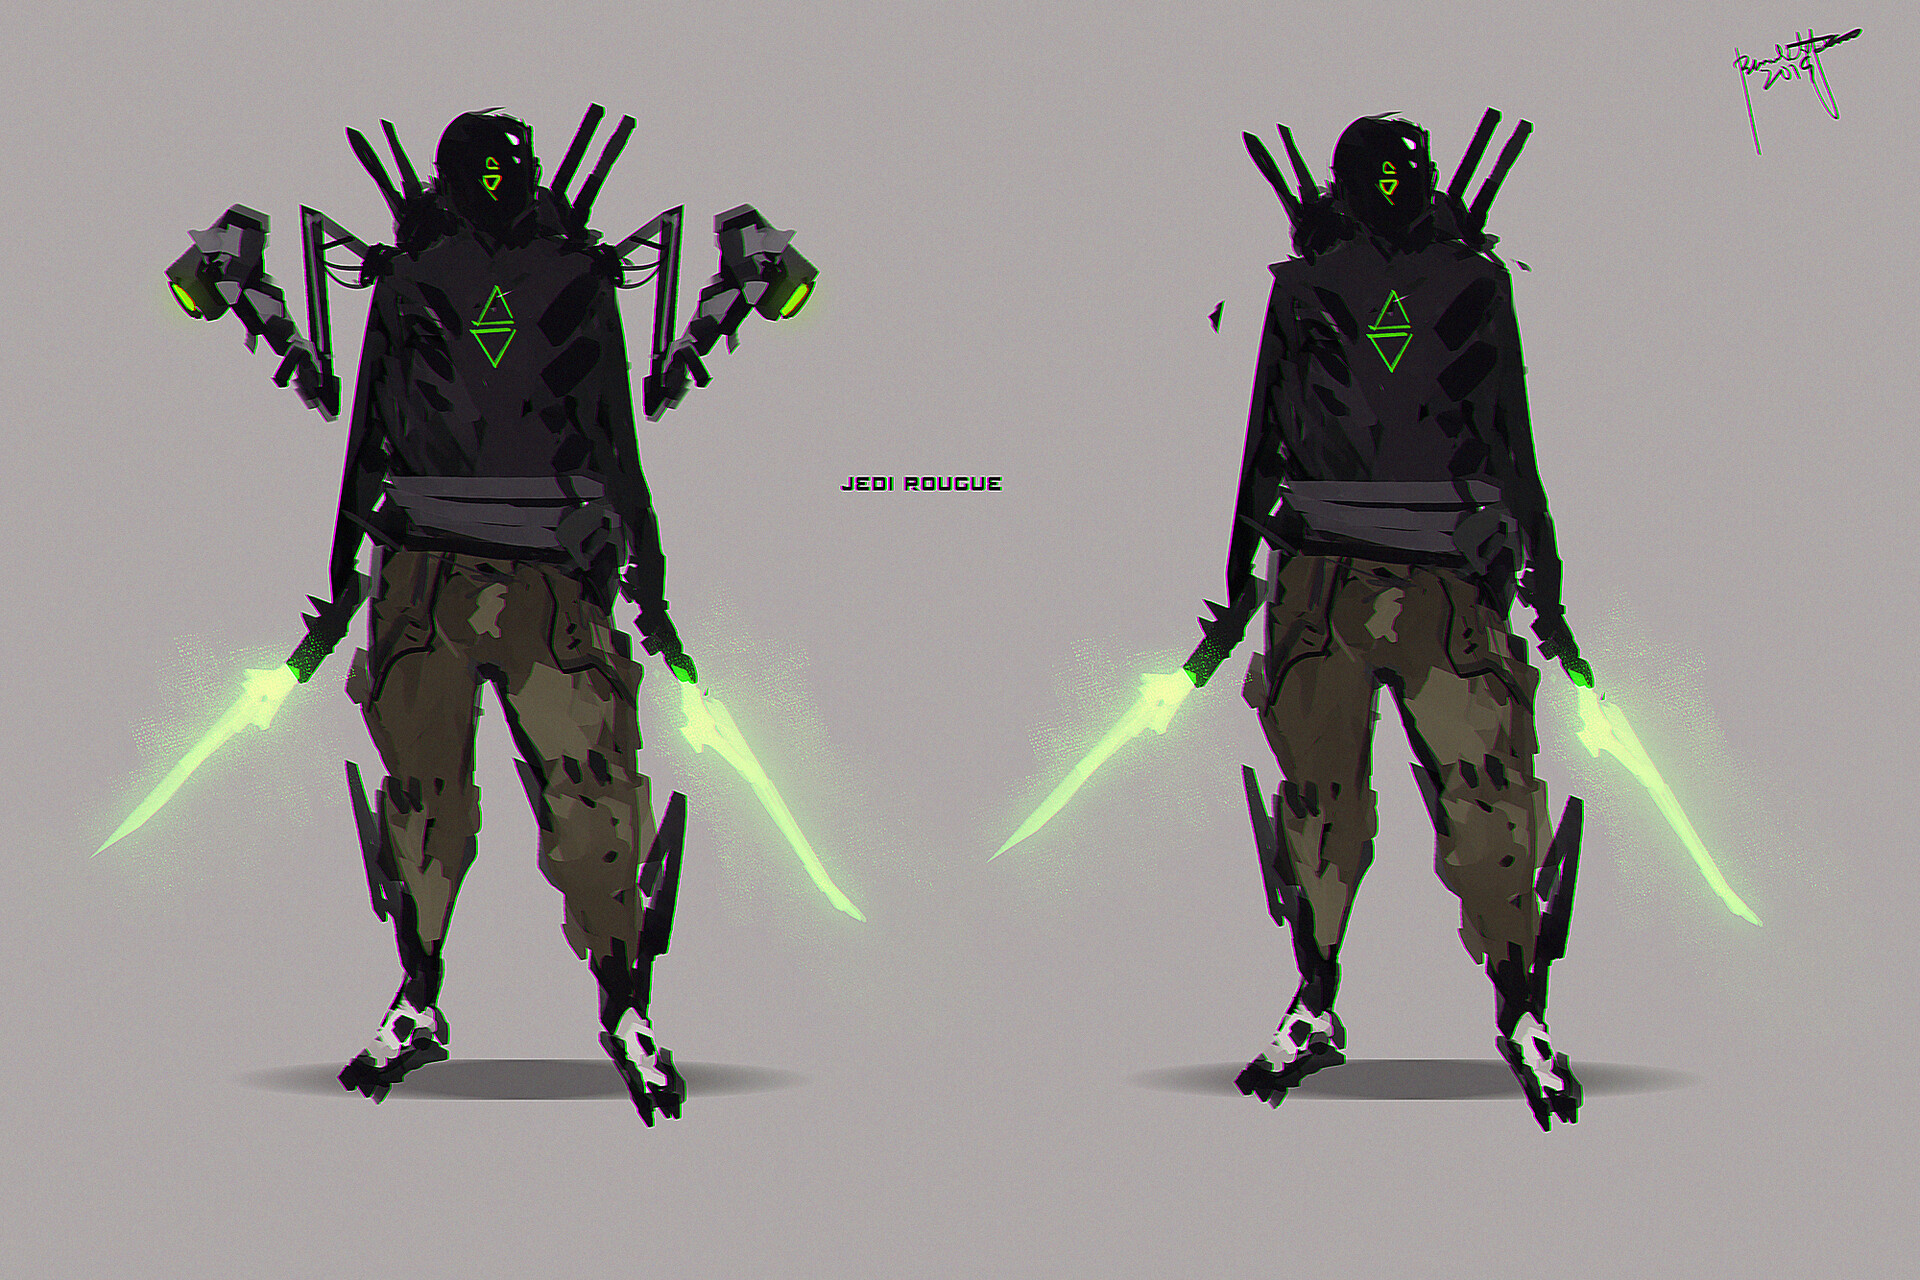 Jedi Assassin